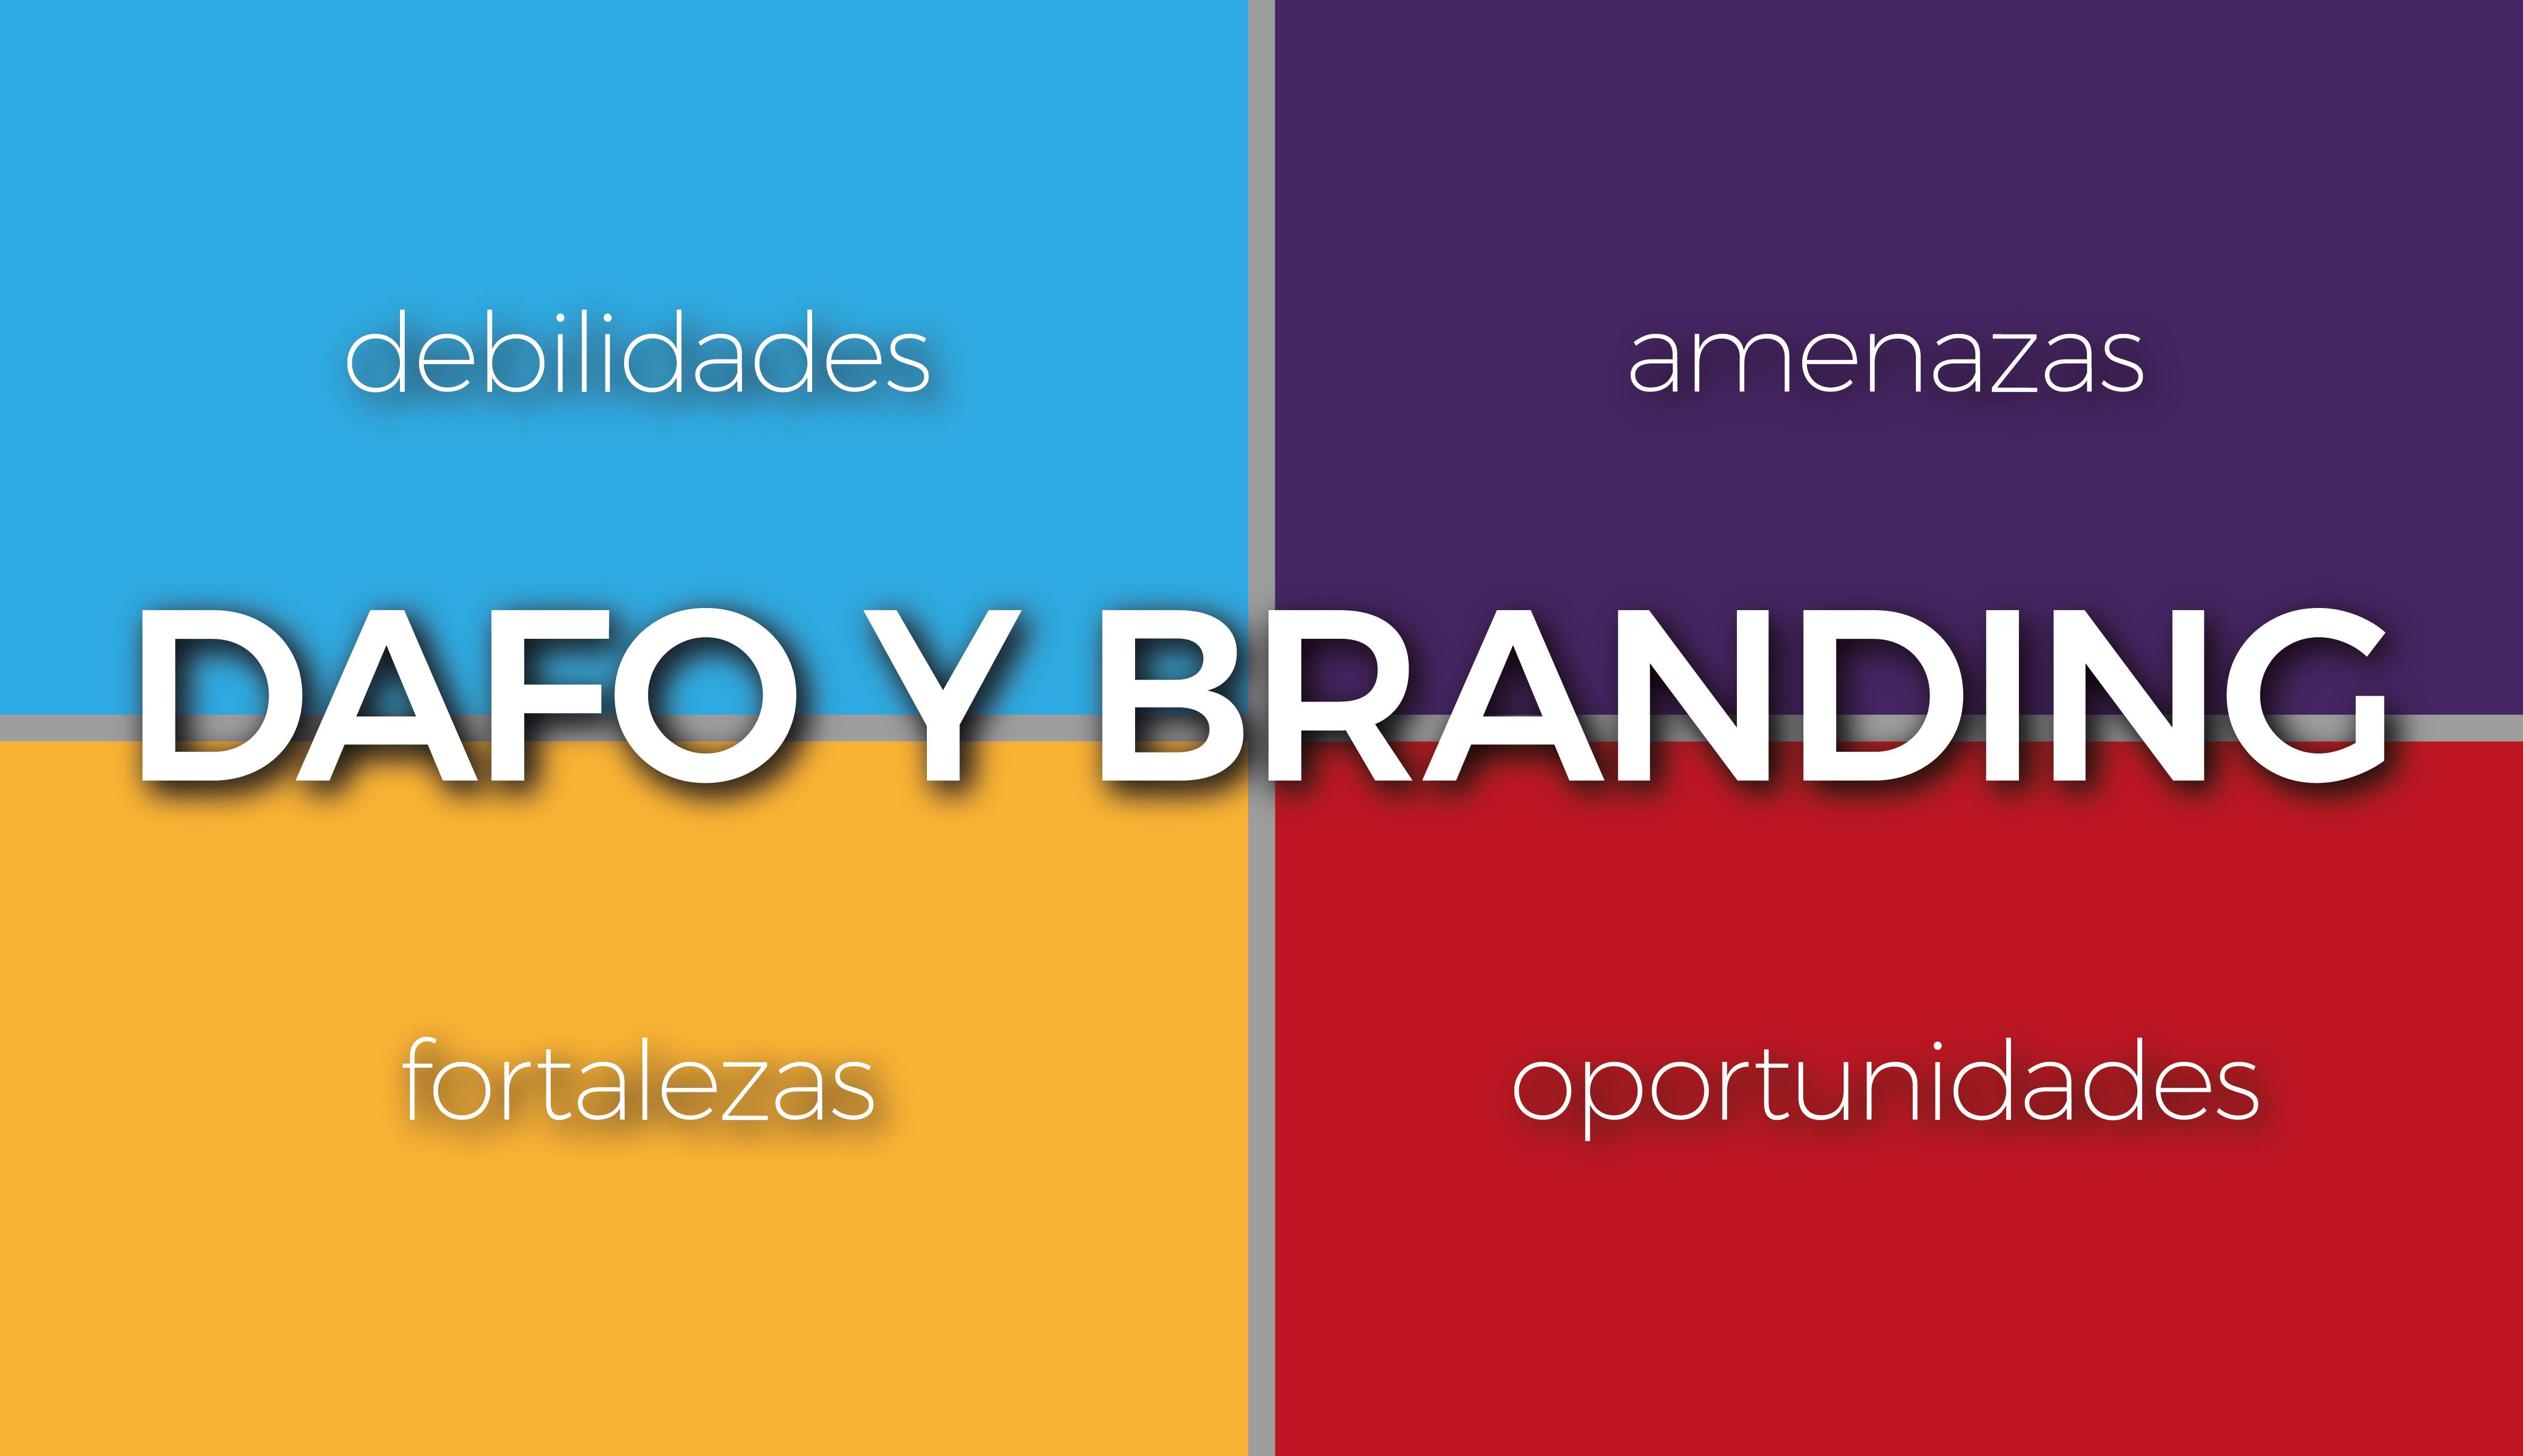 BP-DAFO_branding_11